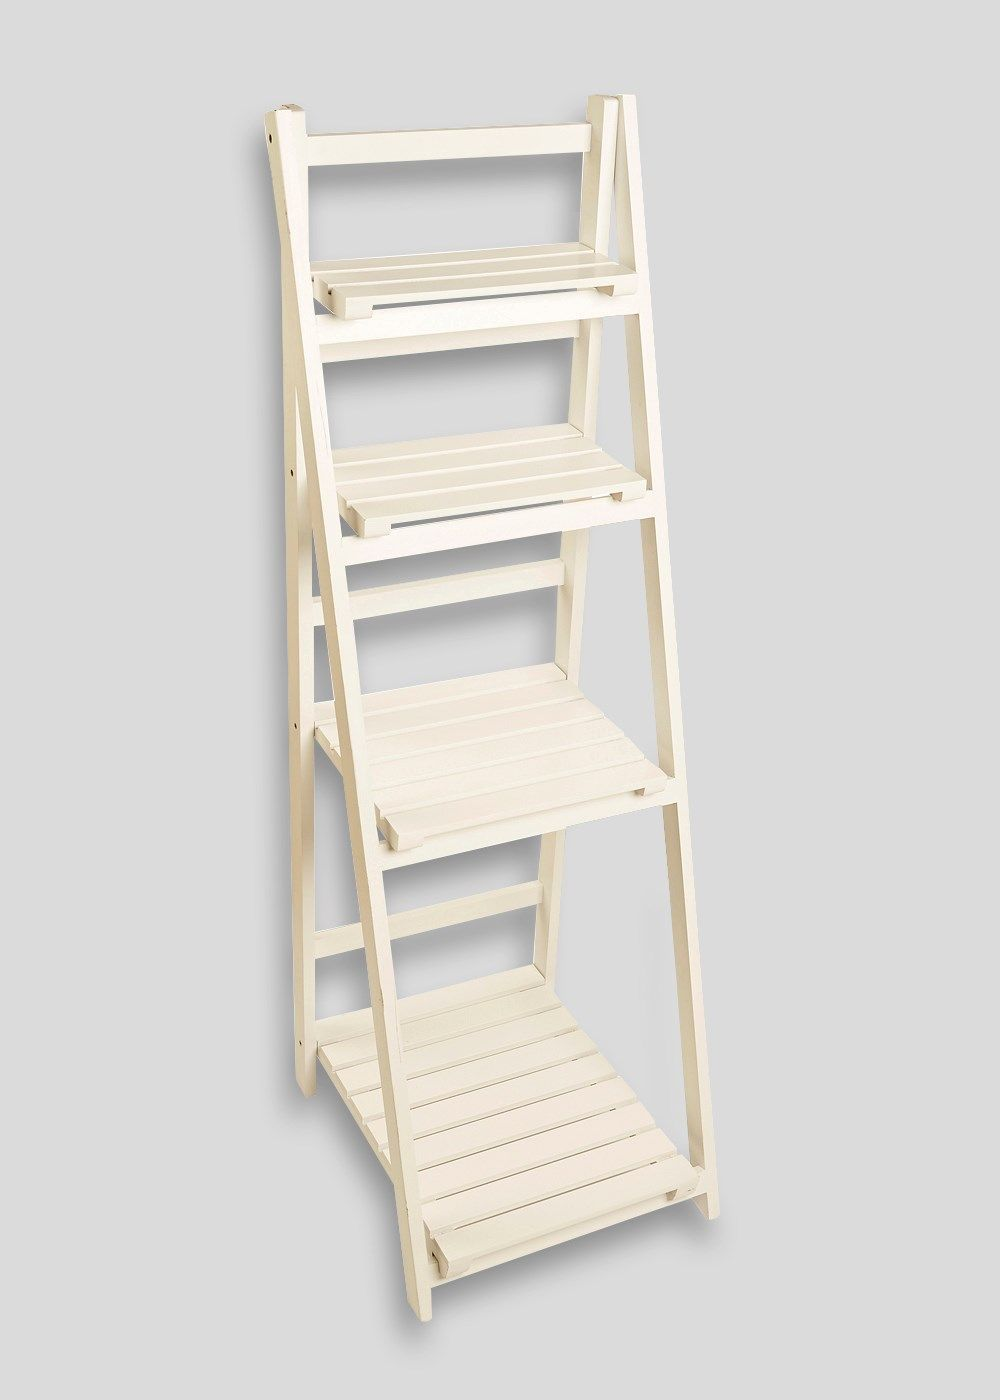 Outstanding 35 00 For Bathroom Slatted Bathroom Shelving Ladder Unit Interior Design Ideas Clesiryabchikinfo